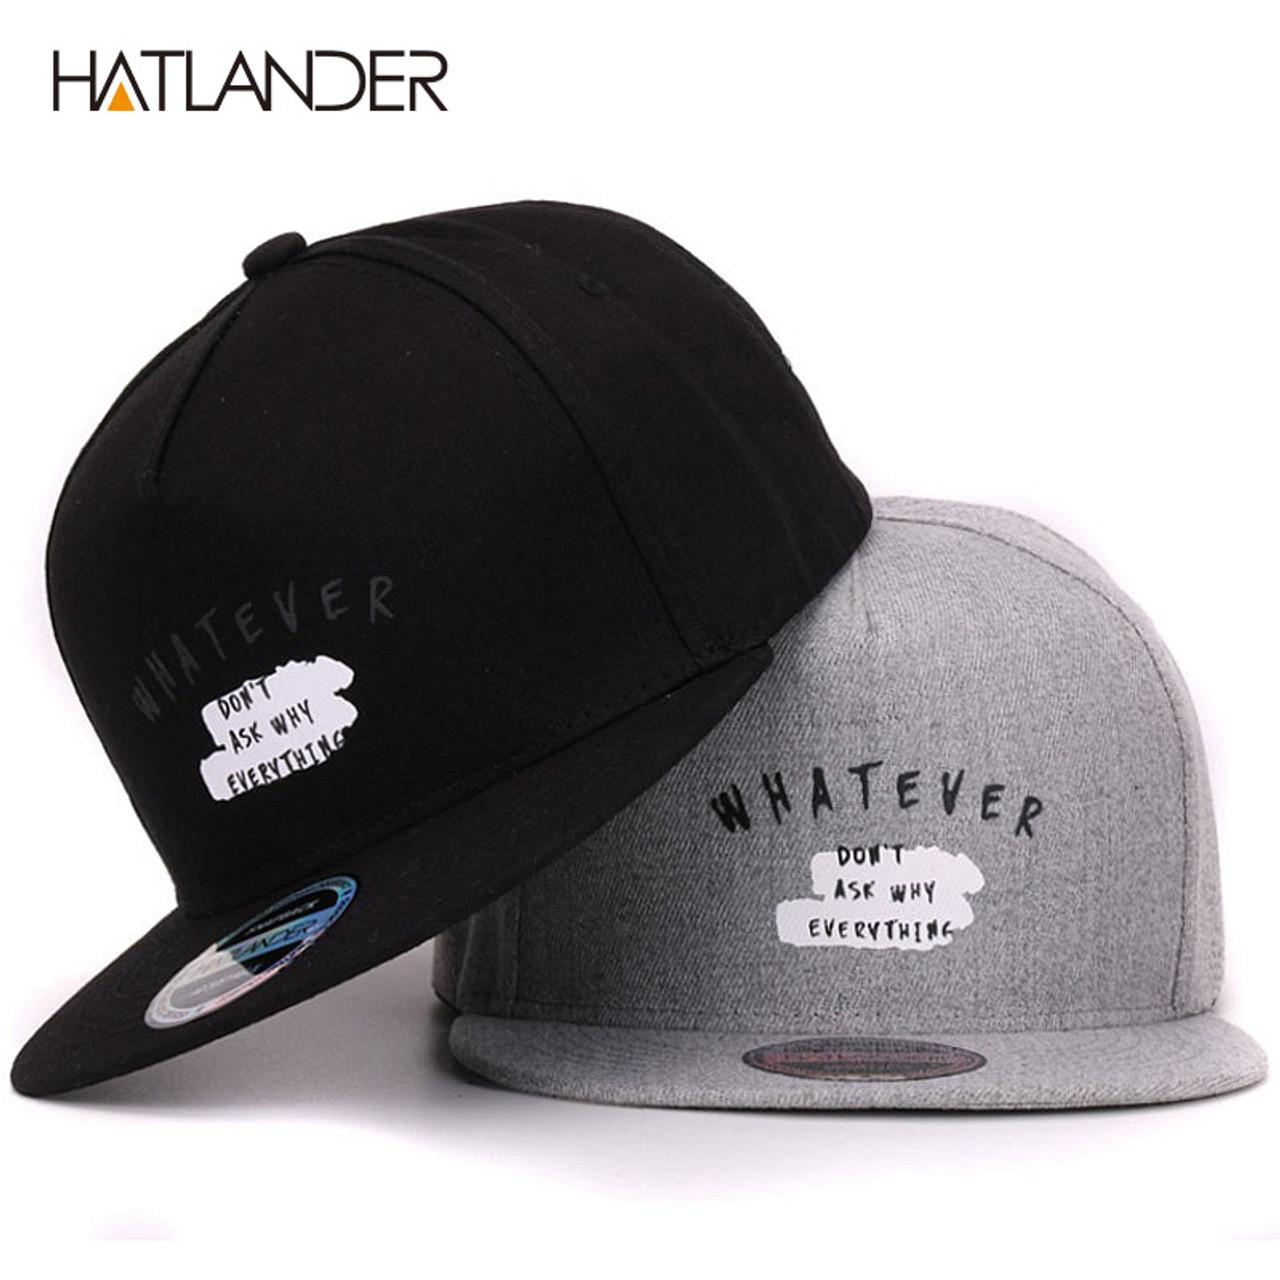 2463500706b  HATLANDER Solid Letter cotton baseball caps for men women outdoor sports  hats 5panel hip hop cap casquette planas snapbacks cap - OnshopDeals.Com